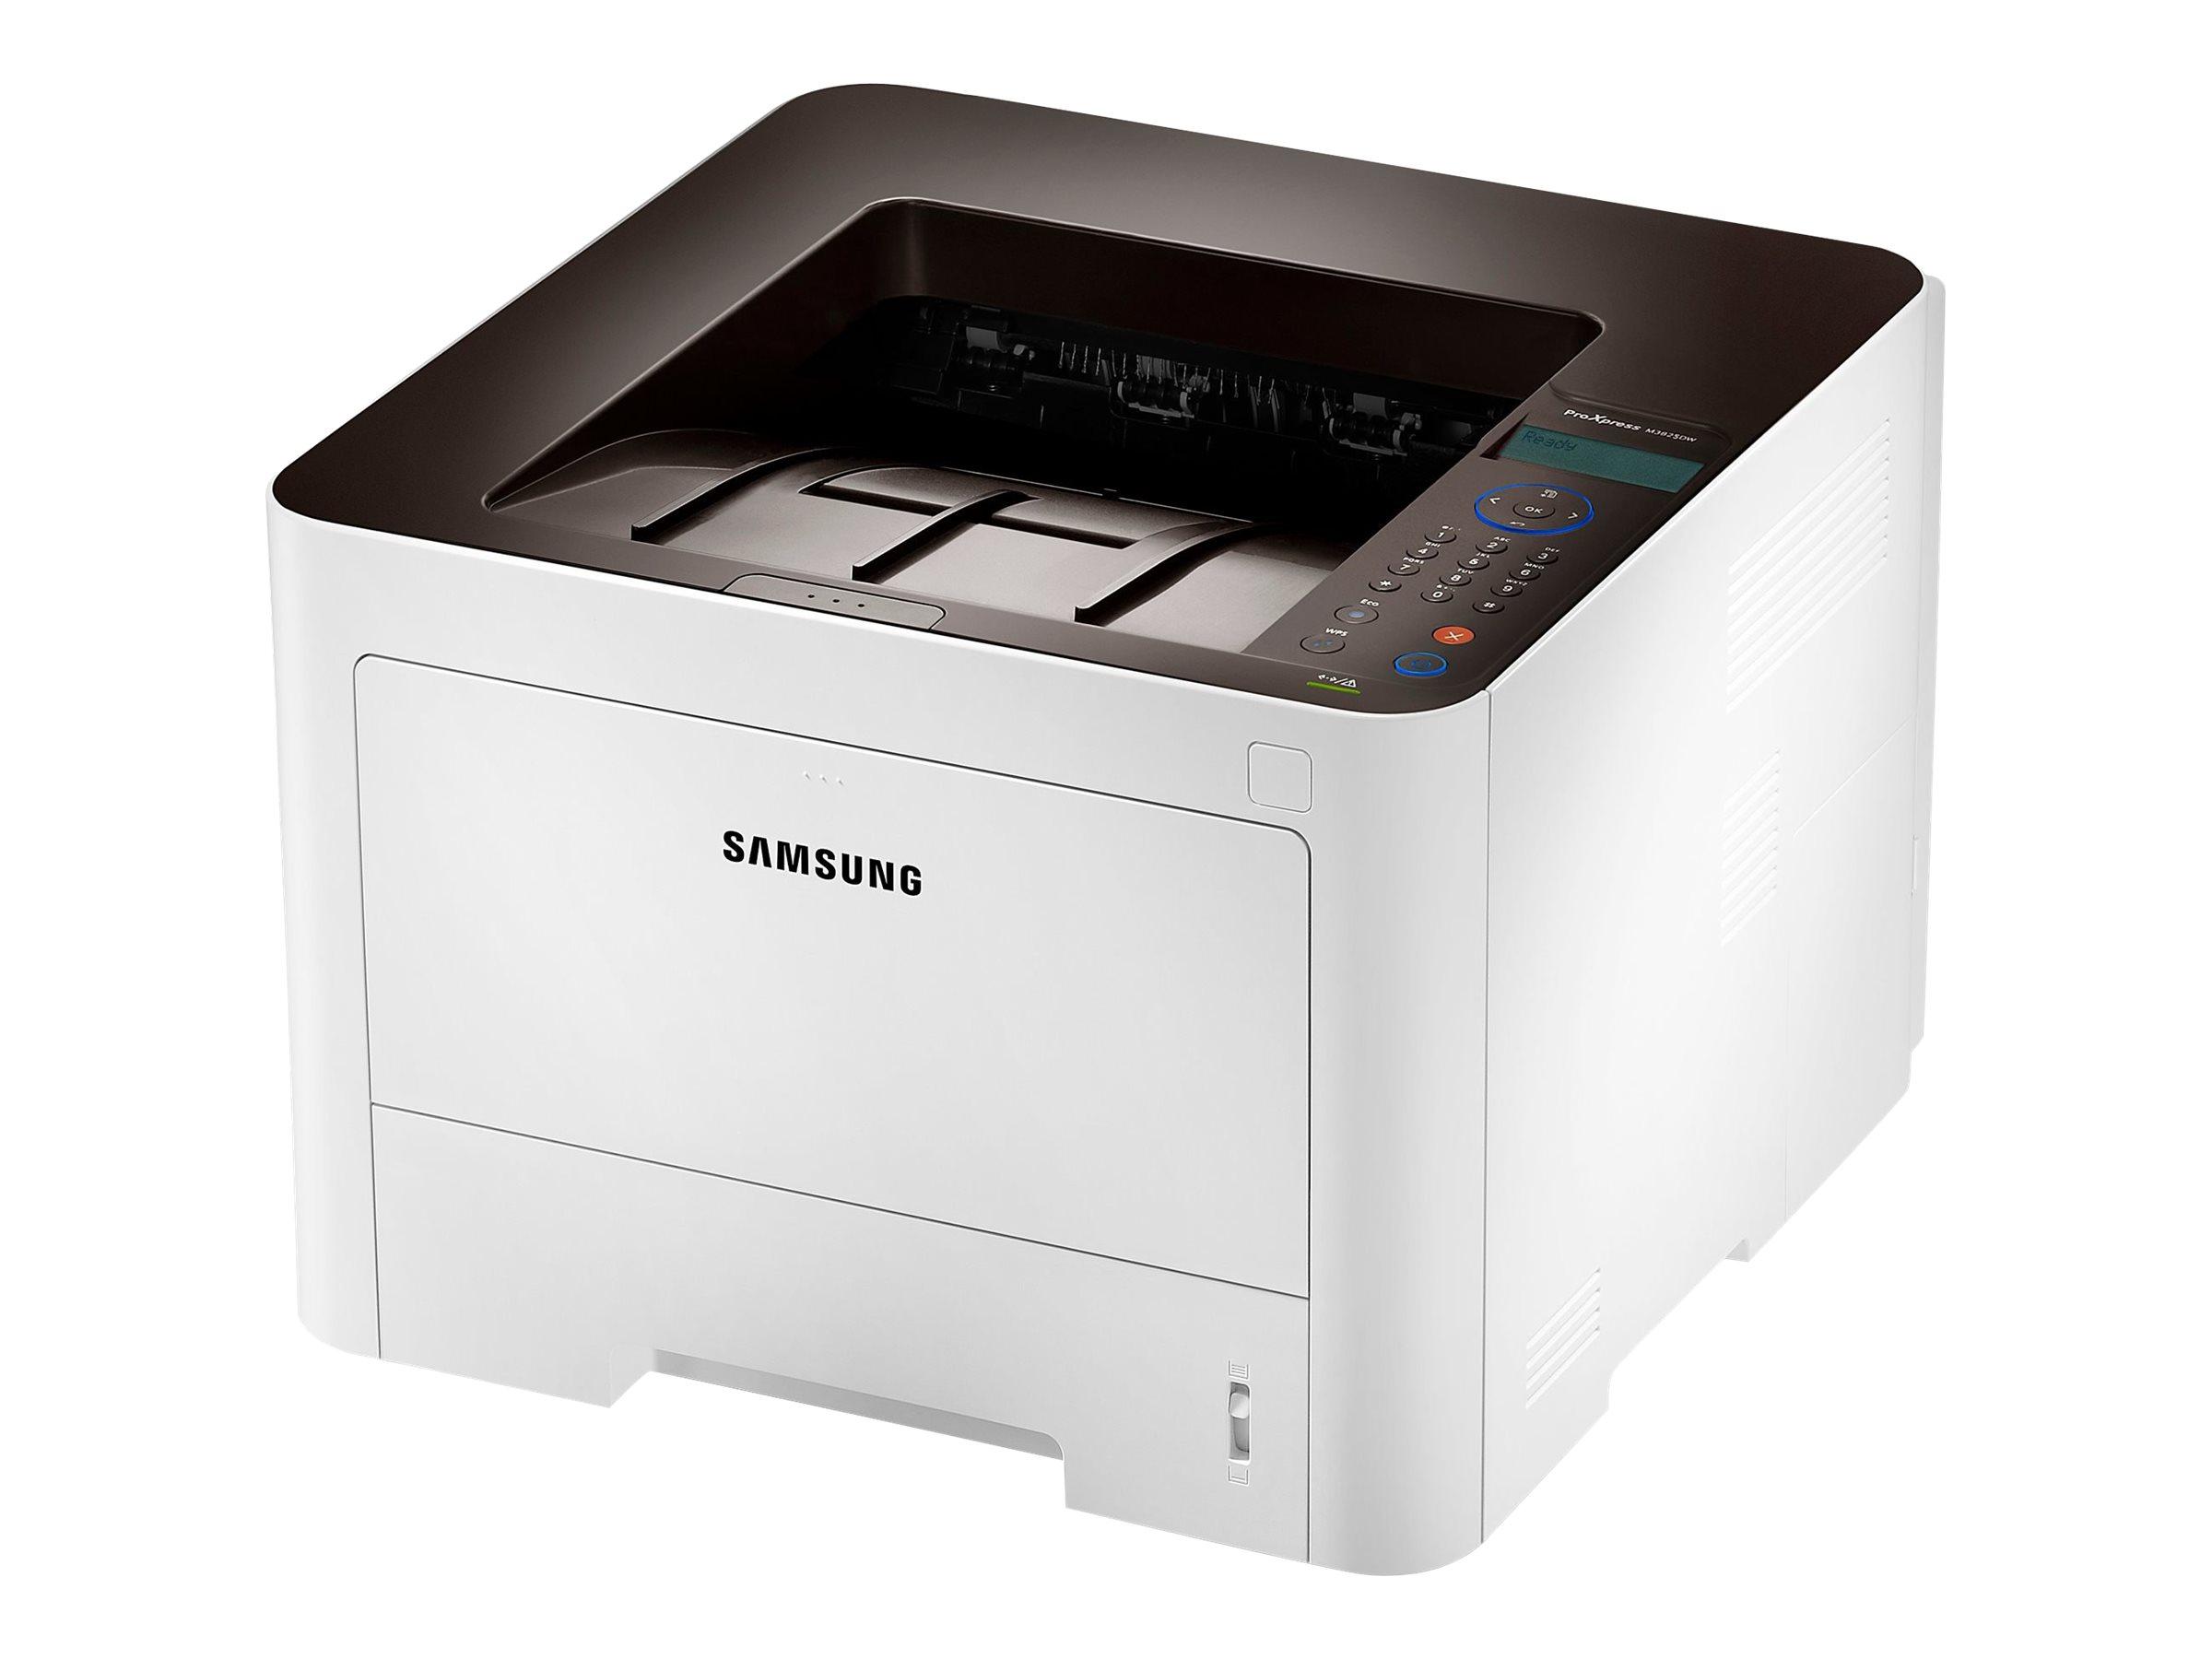 Samsung ProXpress SL-M3825DW - Drucker - monochrom - Duplex - Laser - A4/Legal